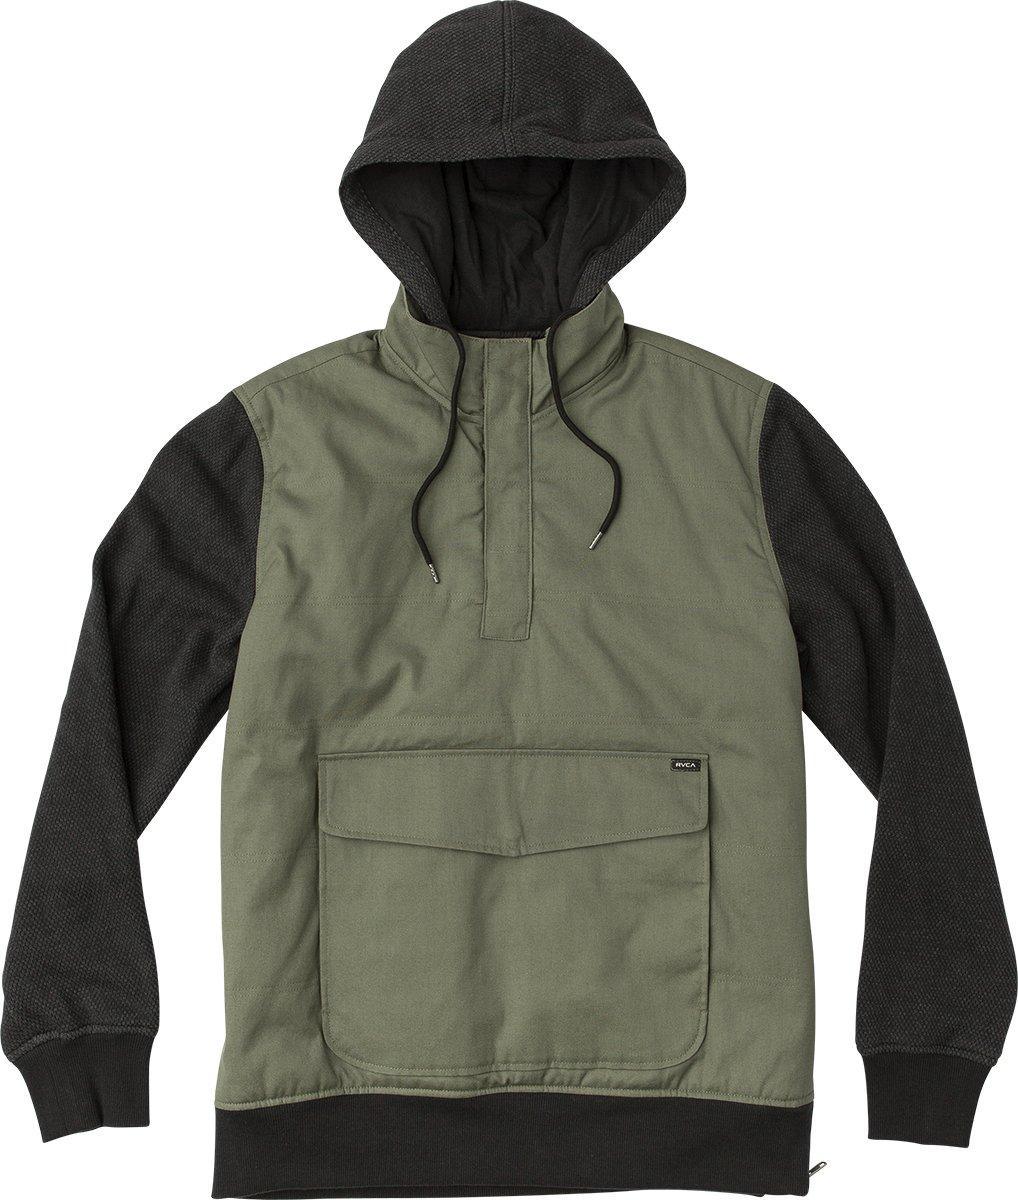 RVCA Men's Grip IT Puffer Jacket, Olive, M